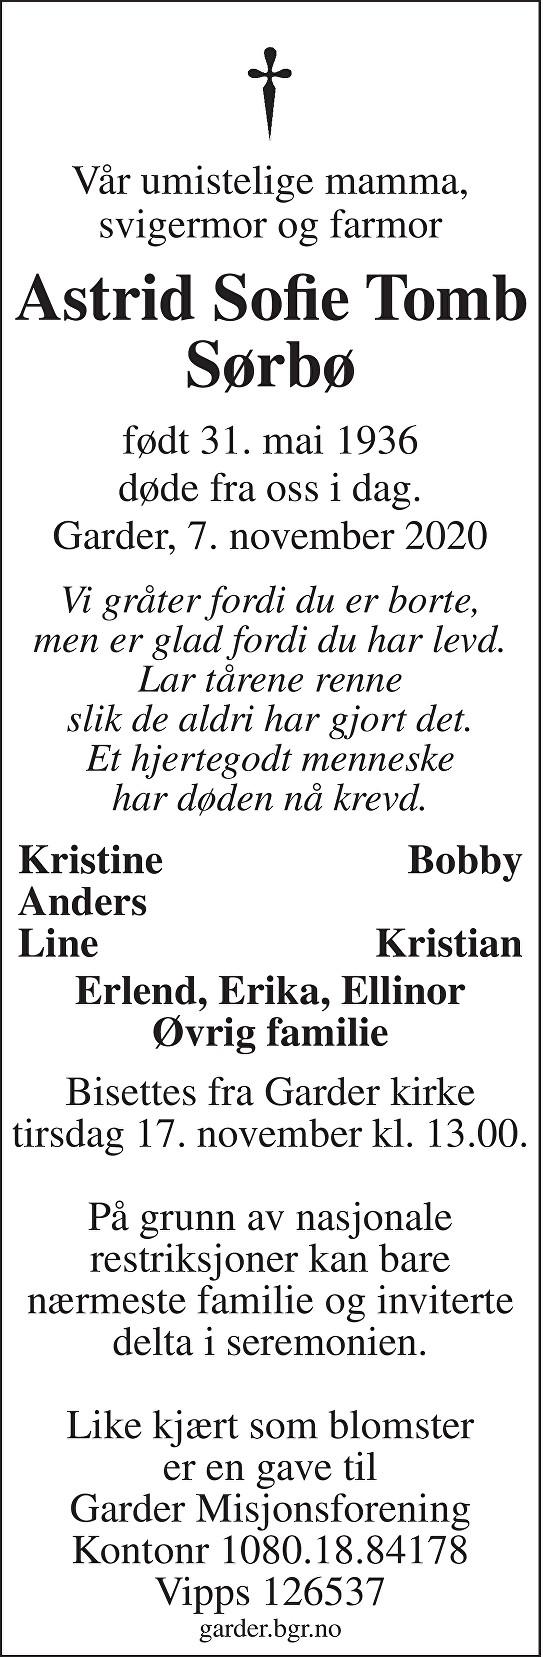 Astrid Sofie Tomb Sørbø Dødsannonse